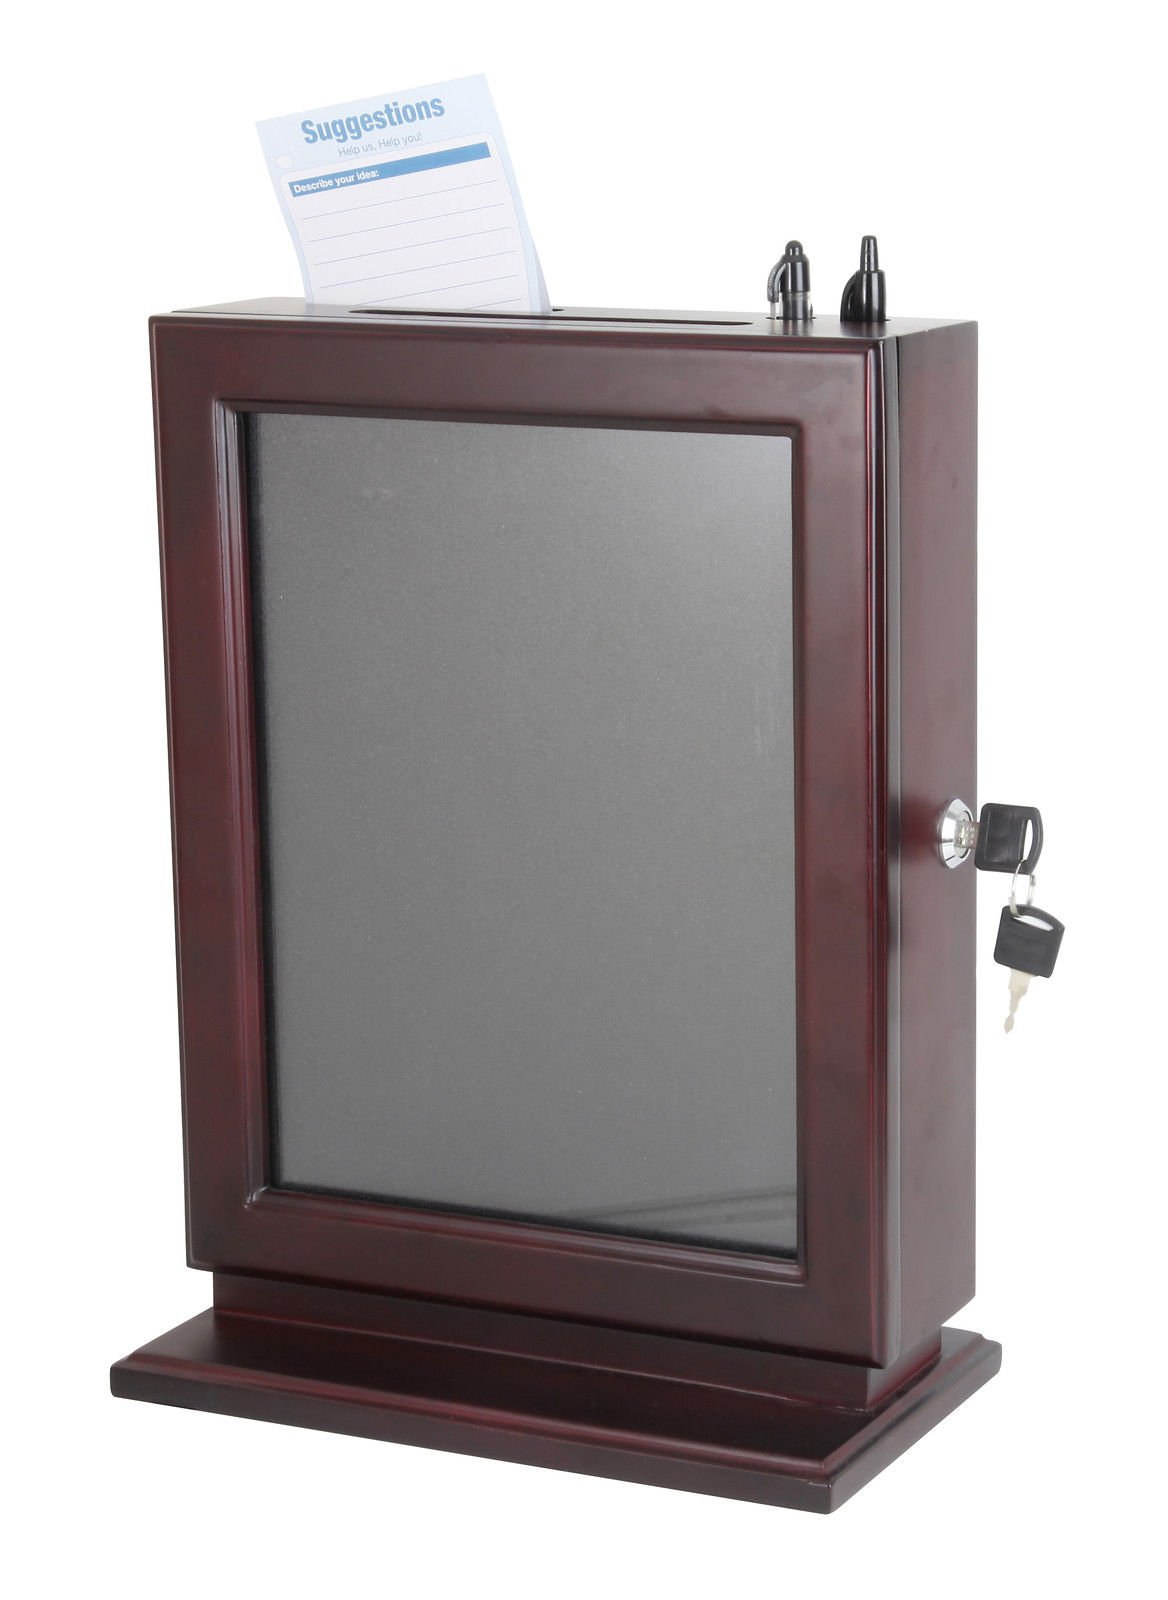 FixtureDisplays Wood Collection Box Suggestion Box Donation Charity Box Fundraising Box 14696